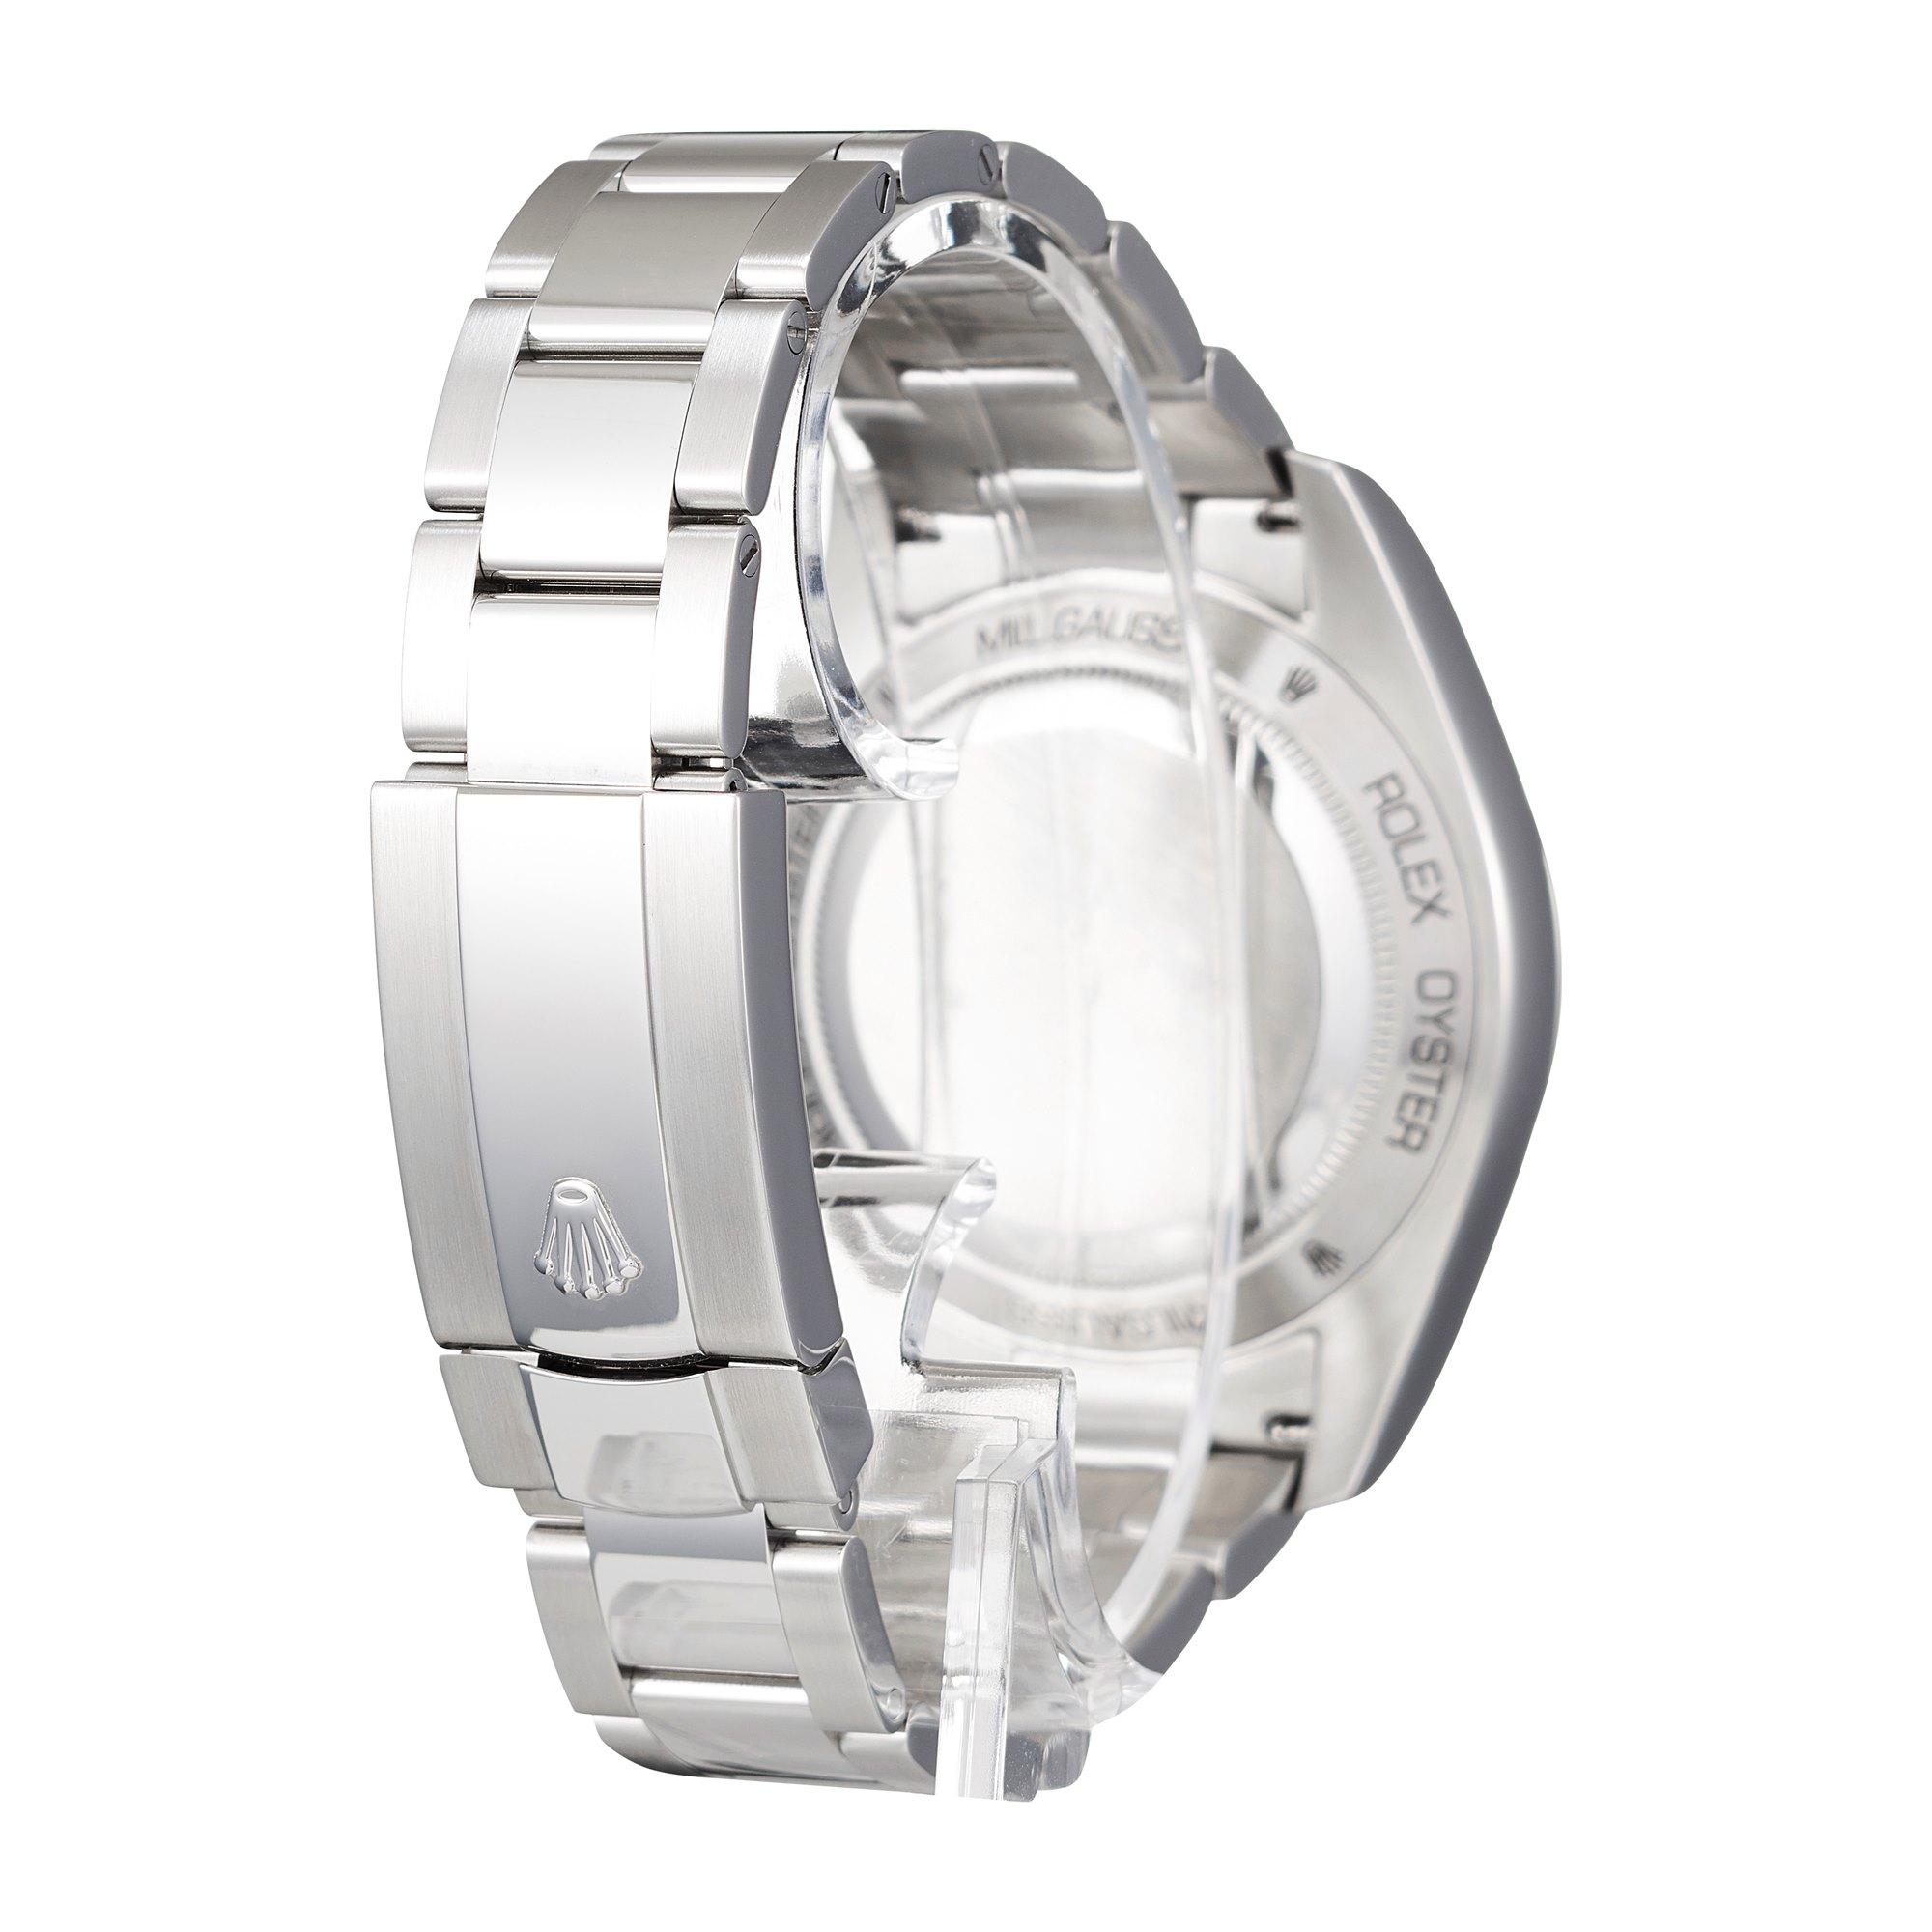 Rolex Milgauss Stainless Steel 116400GV